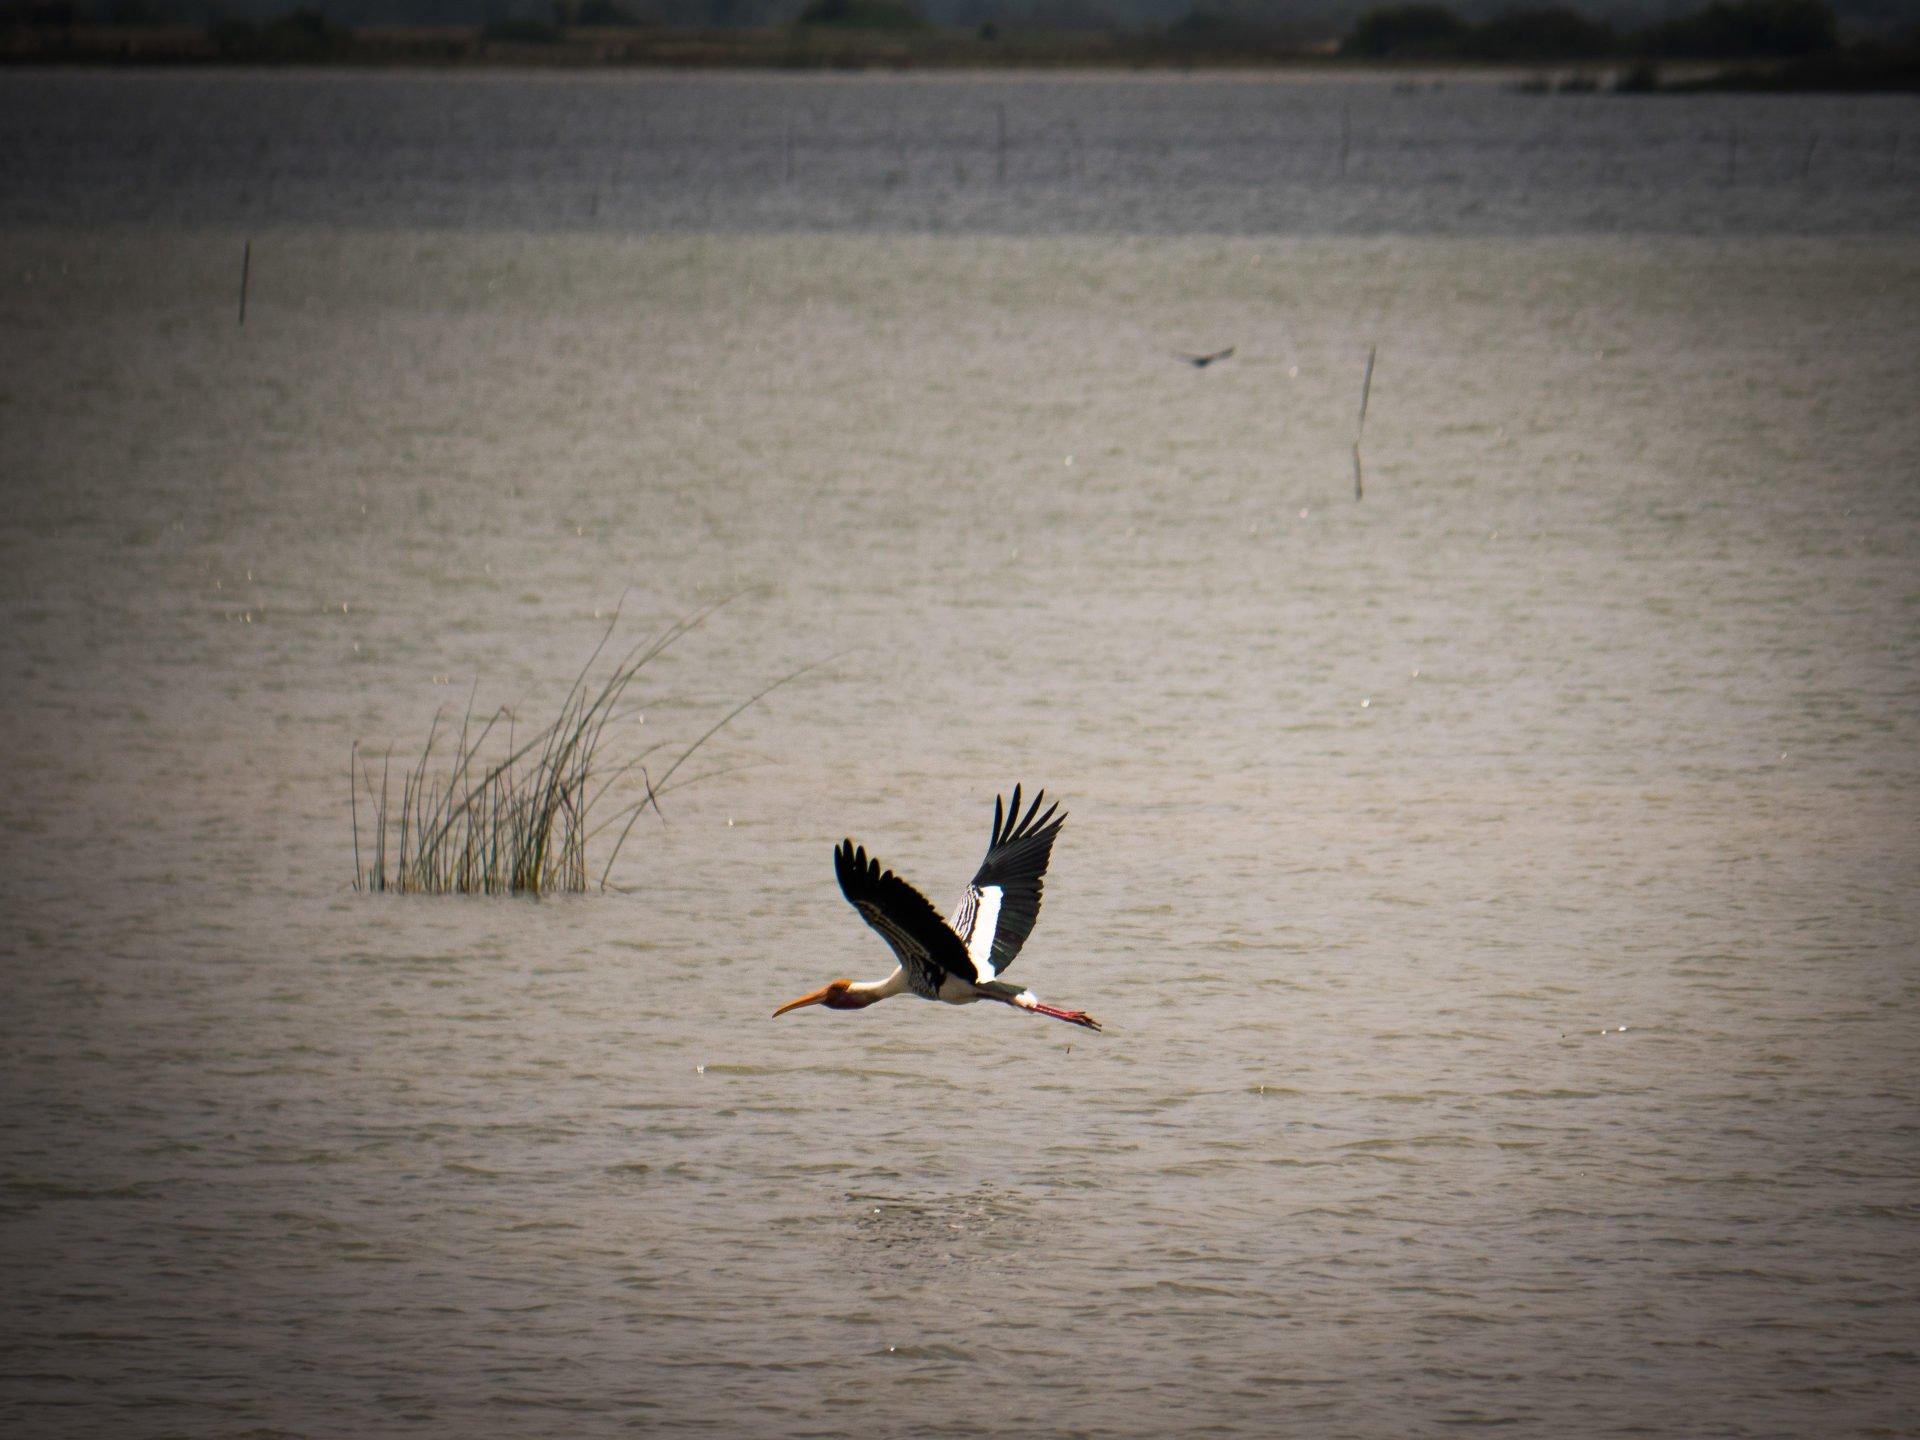 jaffna oiseau - Les globe blogueurs - blog voyage nature